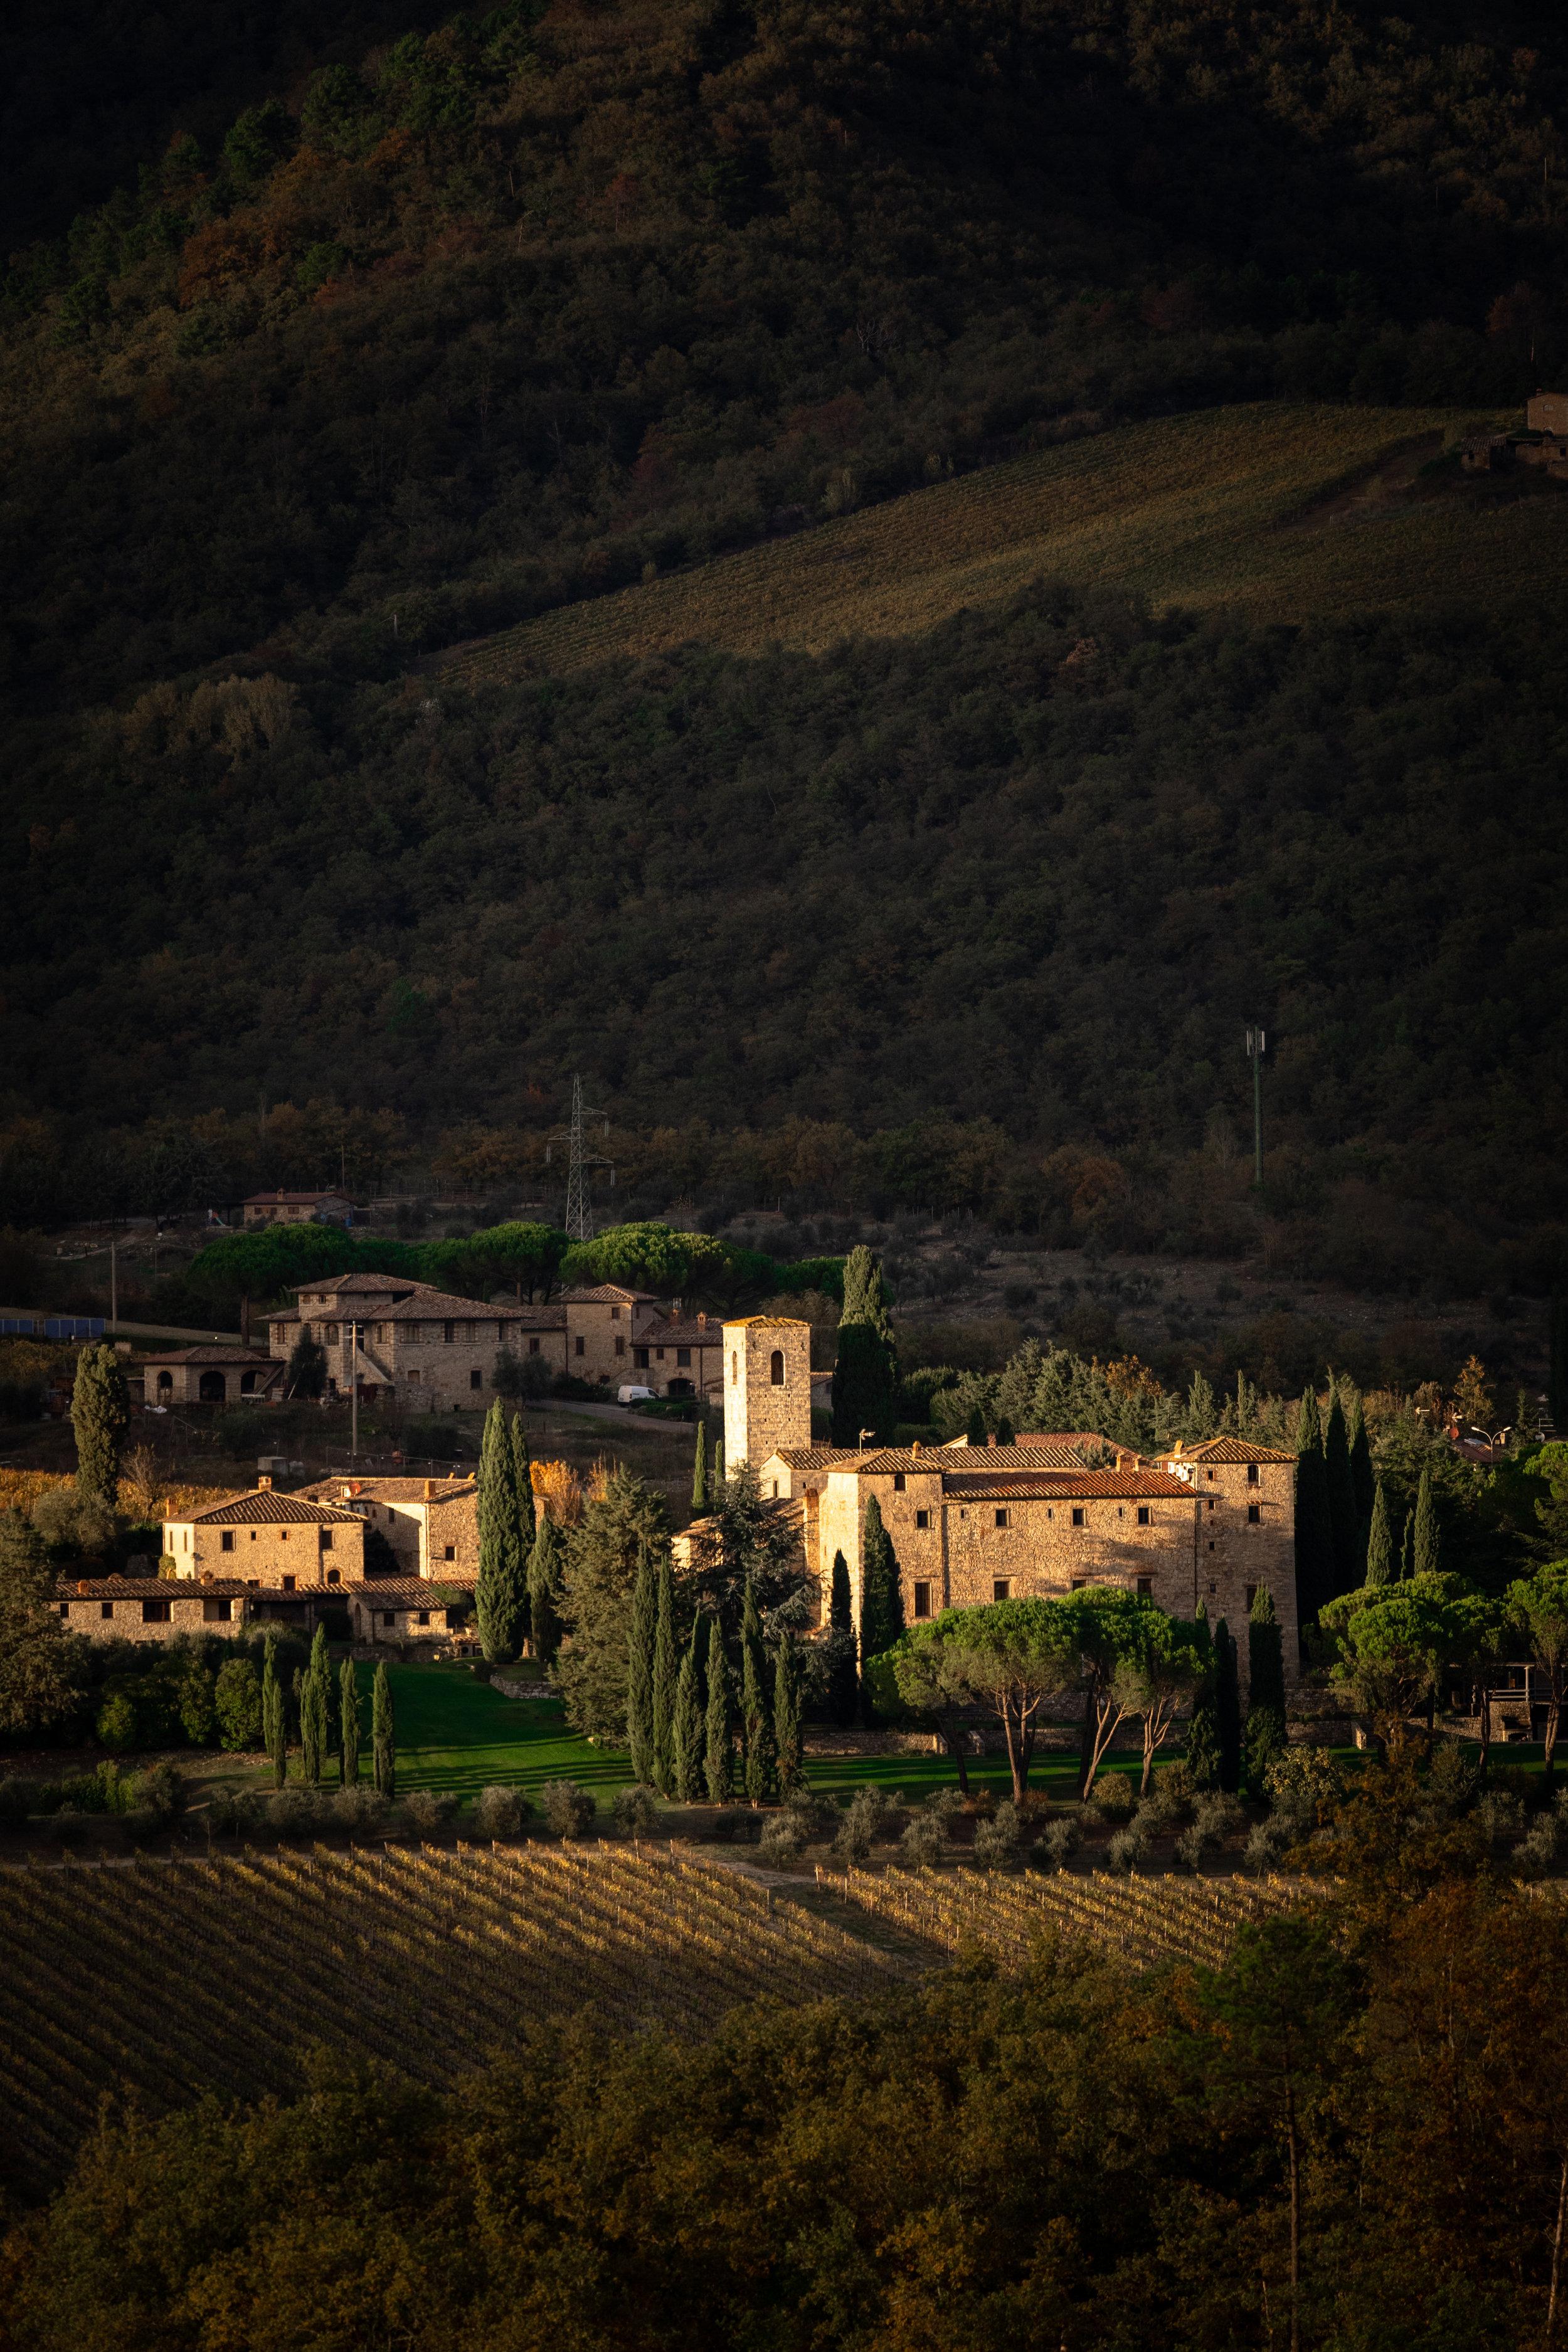 Tuscan countryside vineyards outside Siena